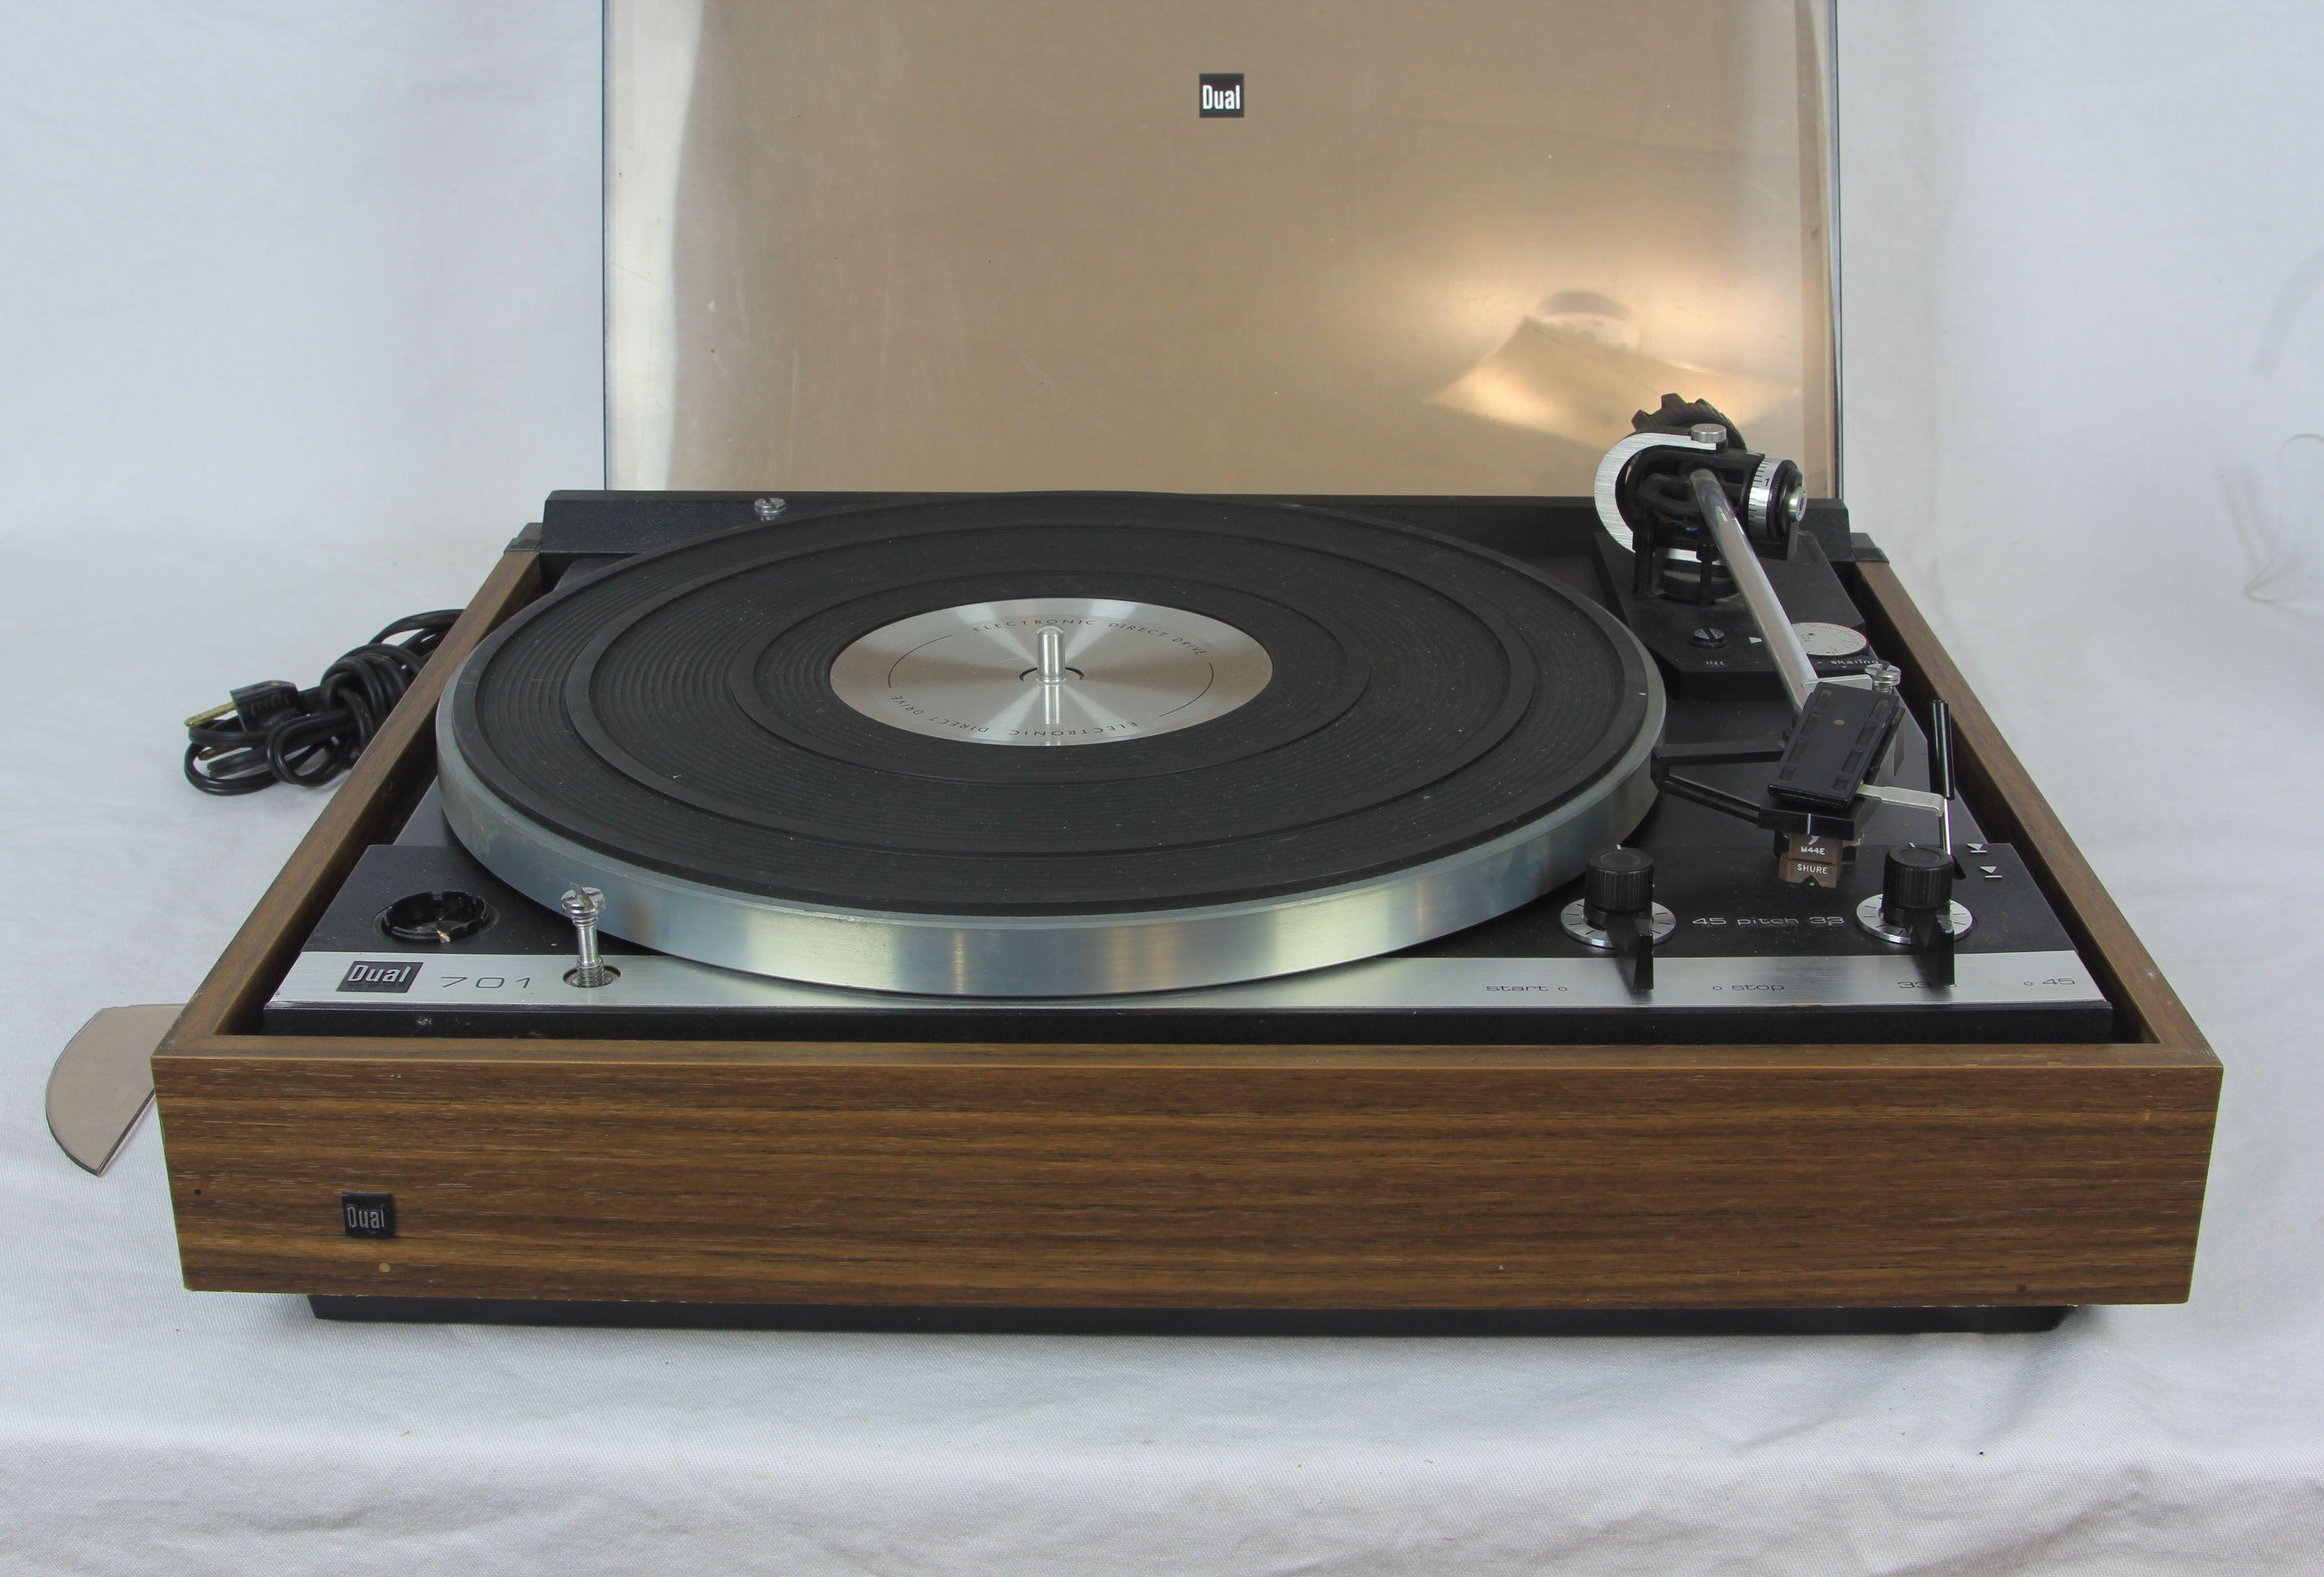 dual 710 turntable c 1970 hifi phiphi pinterest vinyles. Black Bedroom Furniture Sets. Home Design Ideas